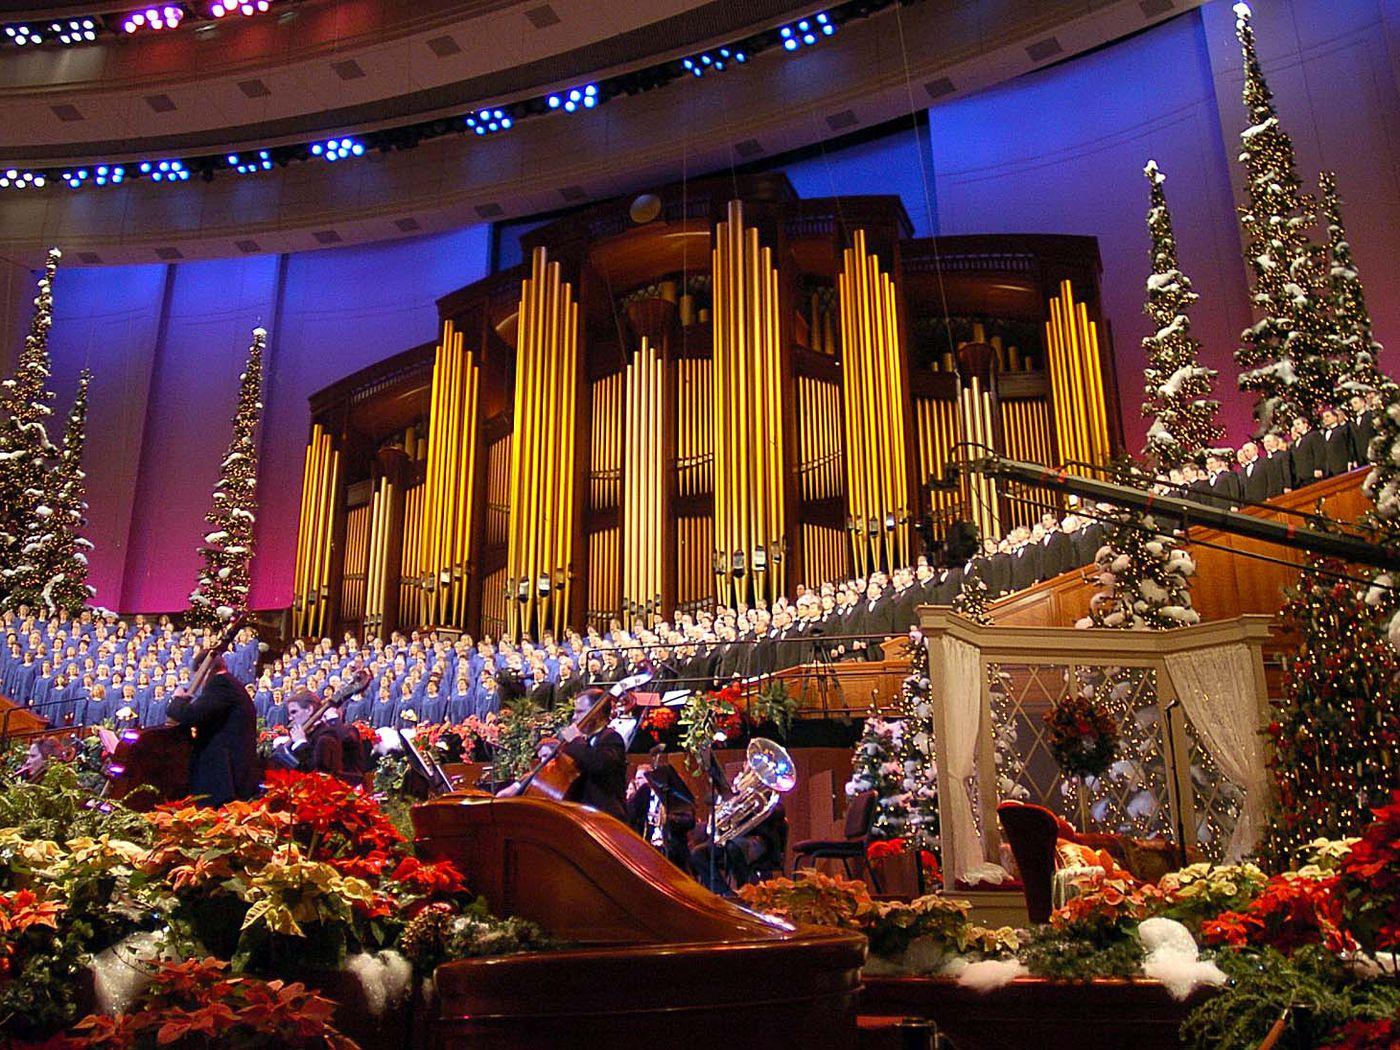 Tabernacle Choir Christmas concert, other 2020 performances